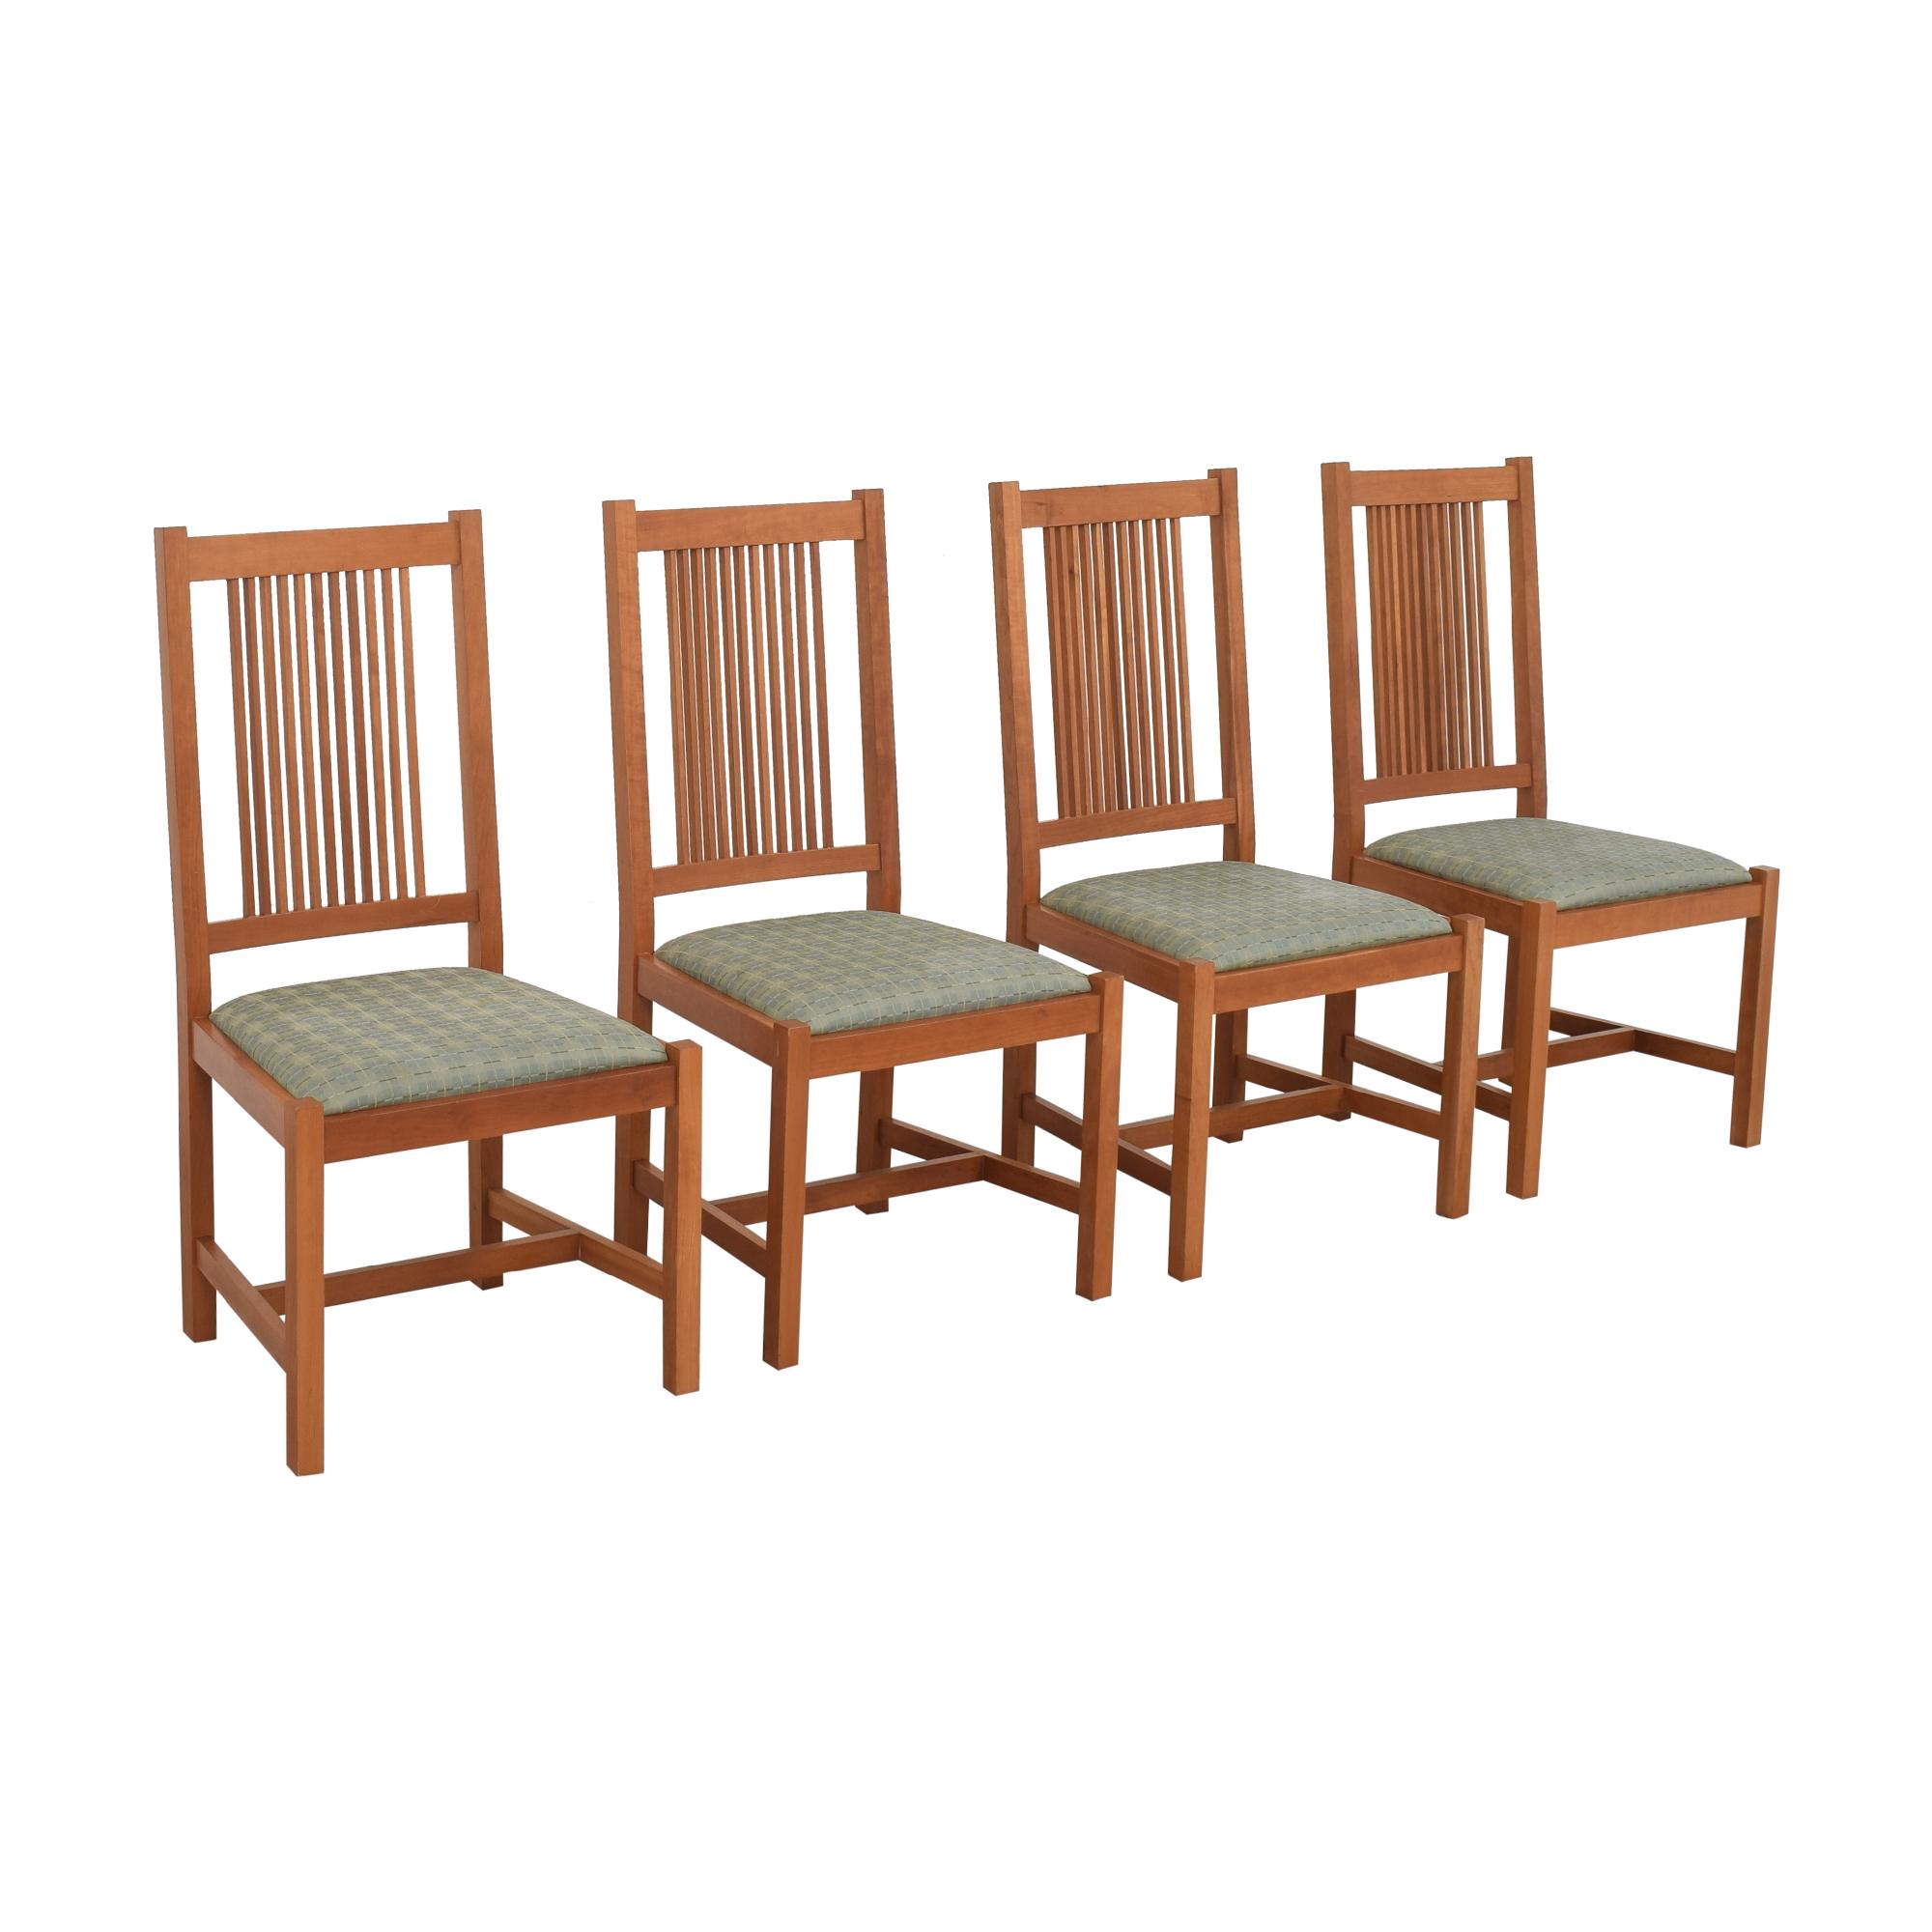 Scott Jordan Mission Style Dining Chairs sale